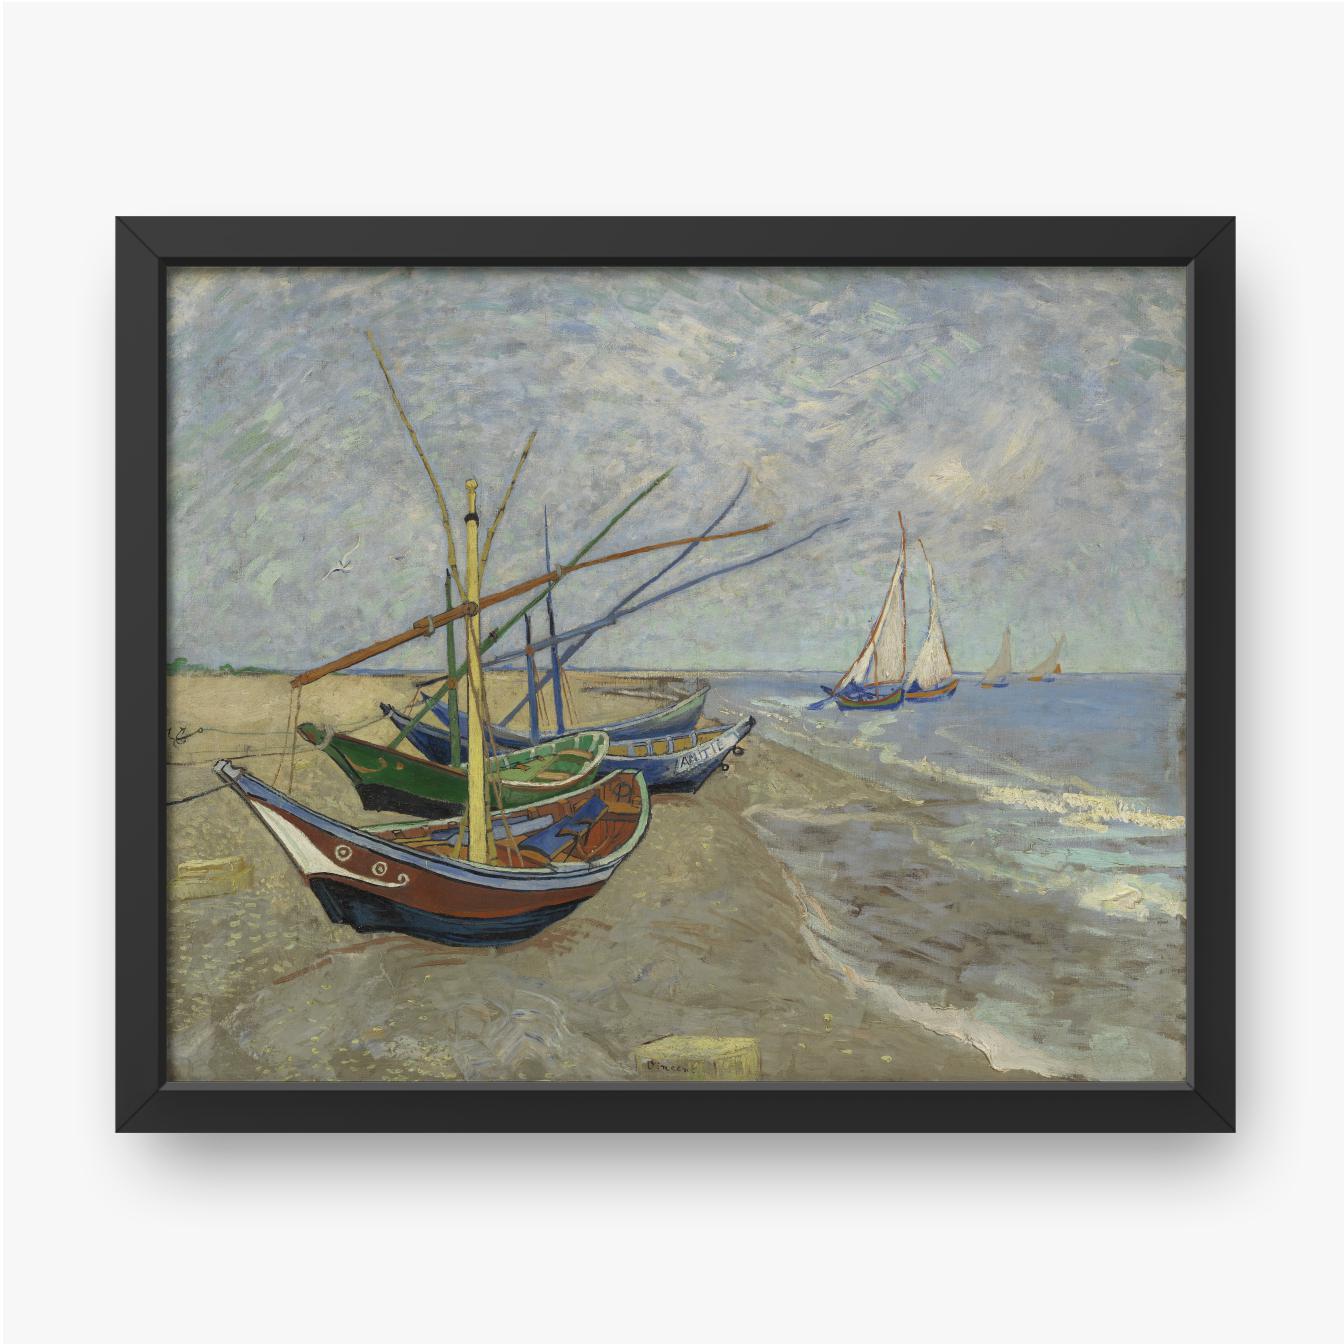 Vincent van Gogh, Łodzie rybackie na plaży w Saintes Maries de la Mer, 1888